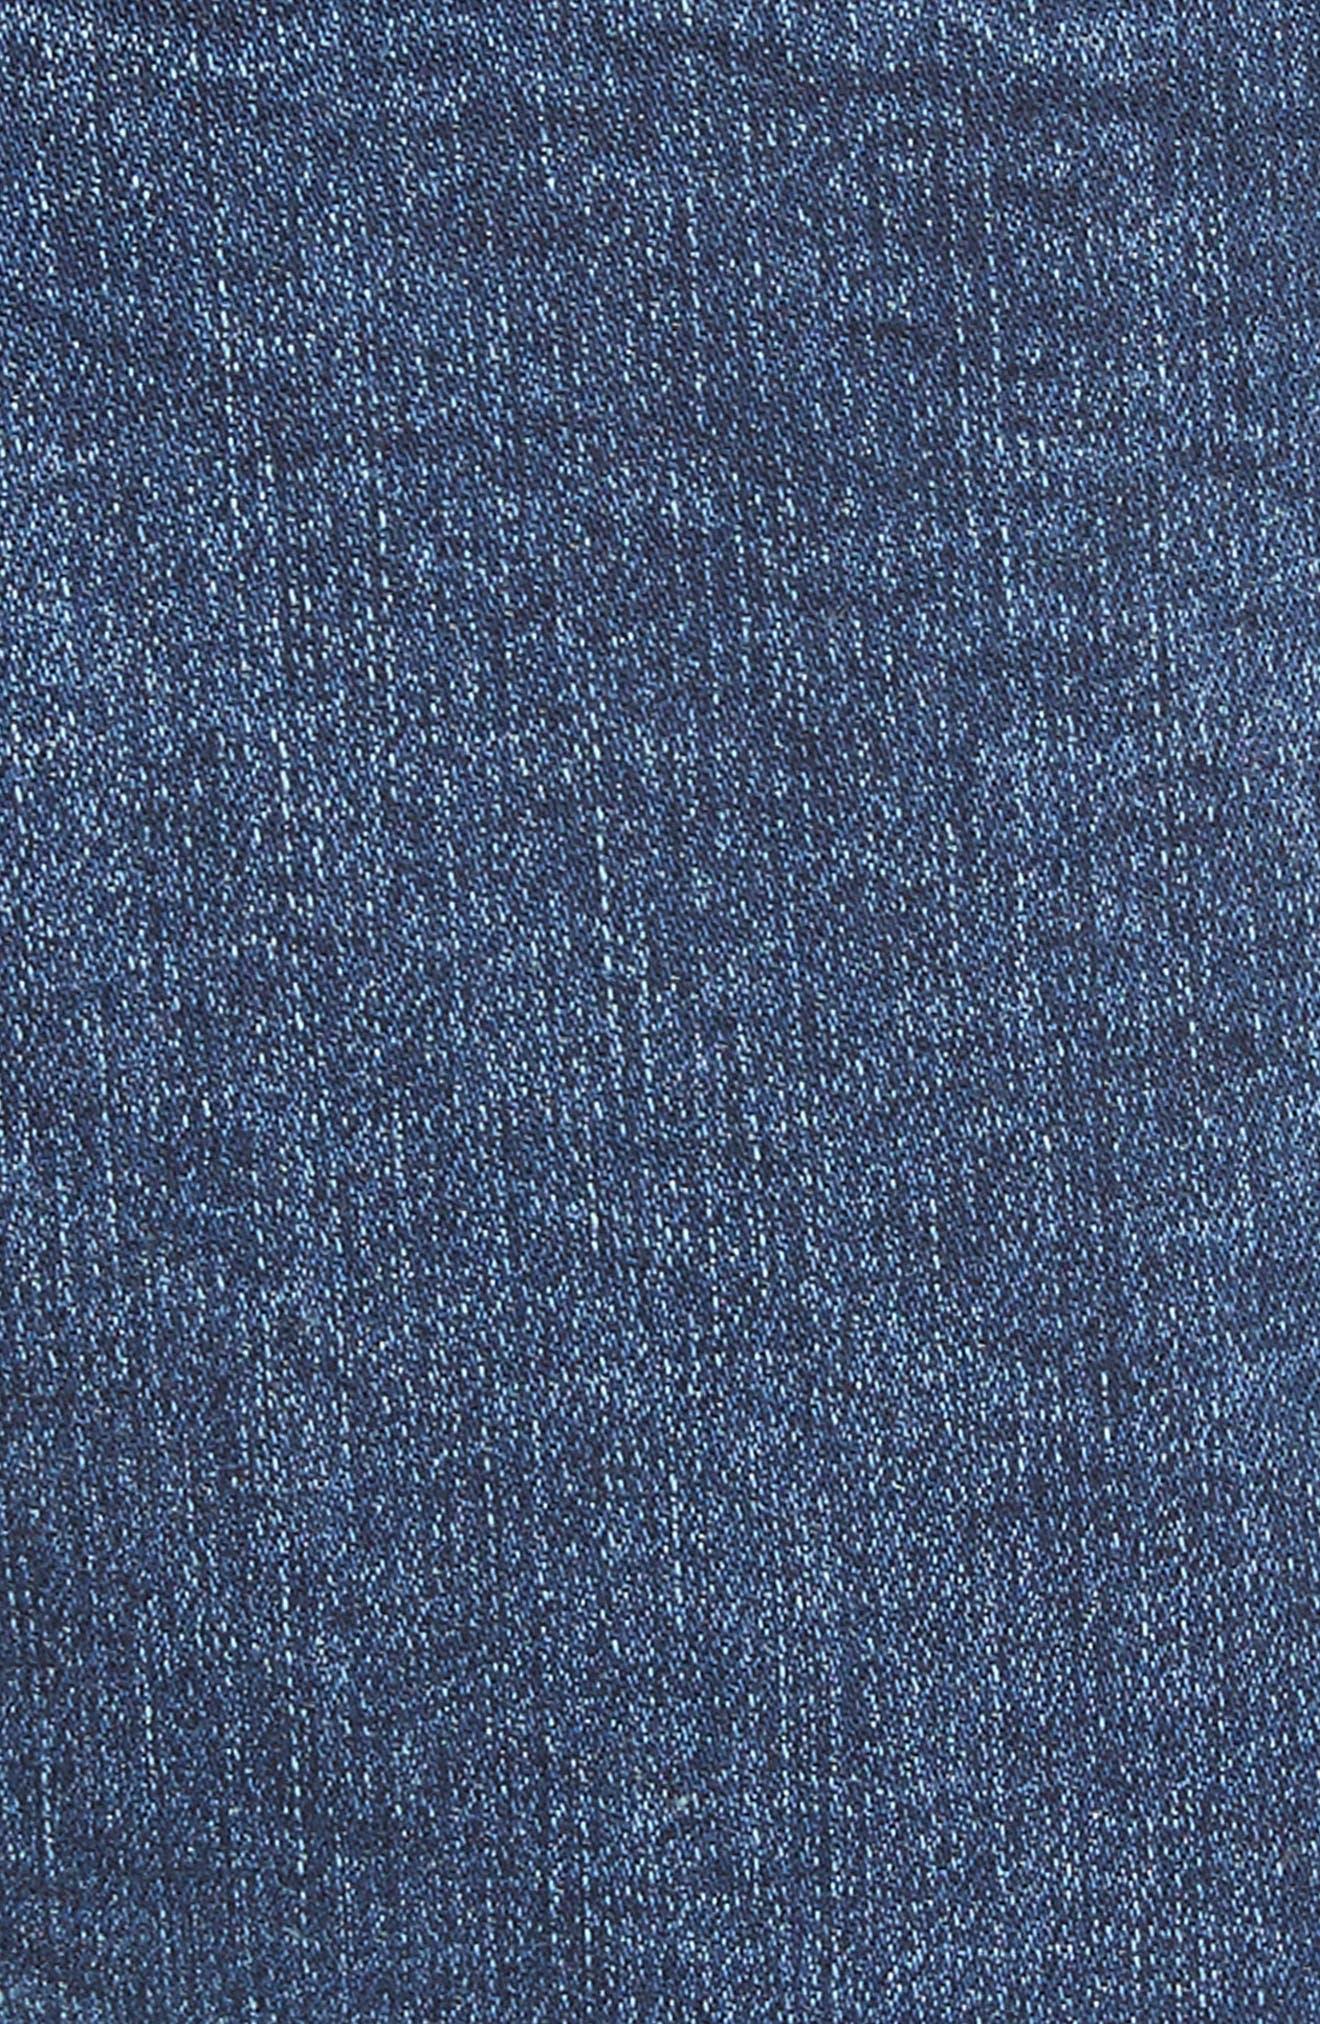 Lace-Up High Waist Denim Leggings,                             Alternate thumbnail 5, color,                             400